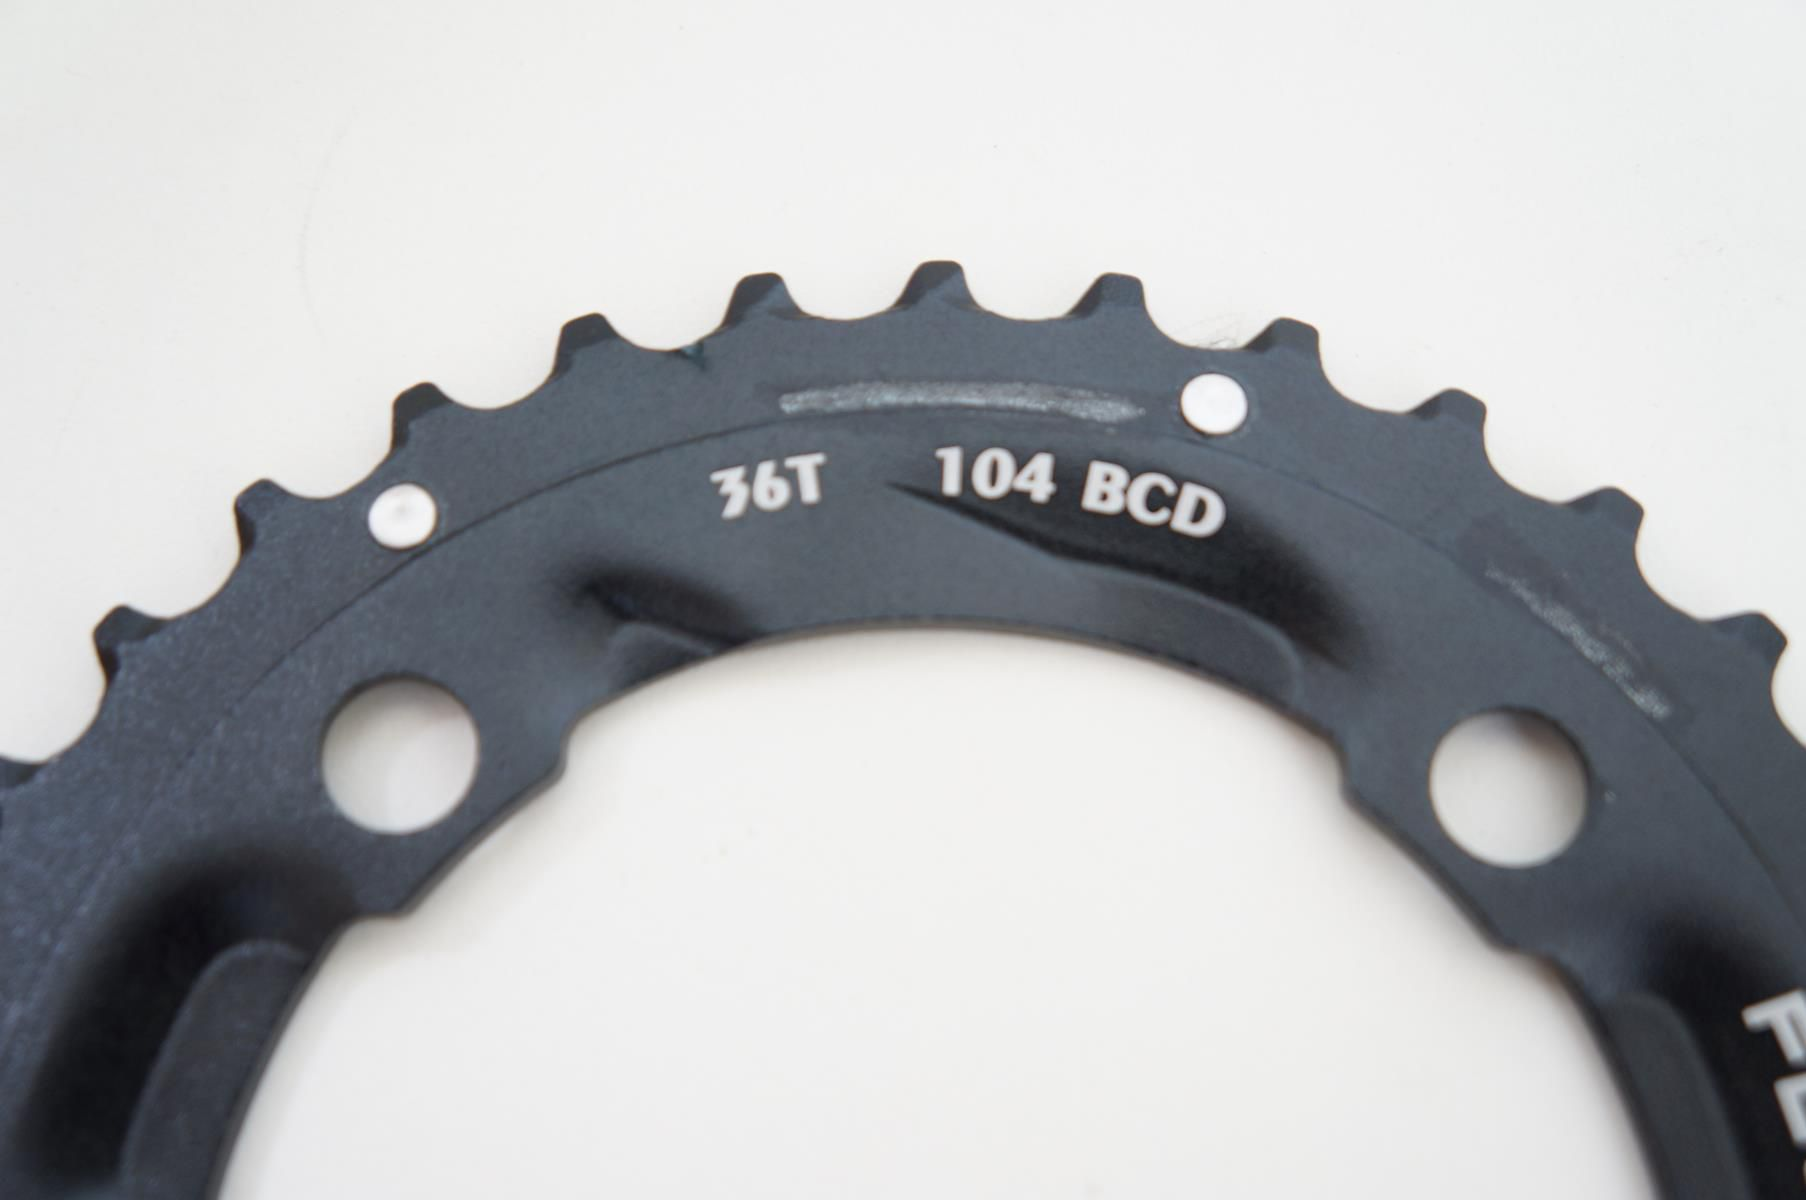 Coroa Dupla Mtb Sunrace 36 dentes 2x10 Bcd 104mm em Aluminio Serve para Shimano